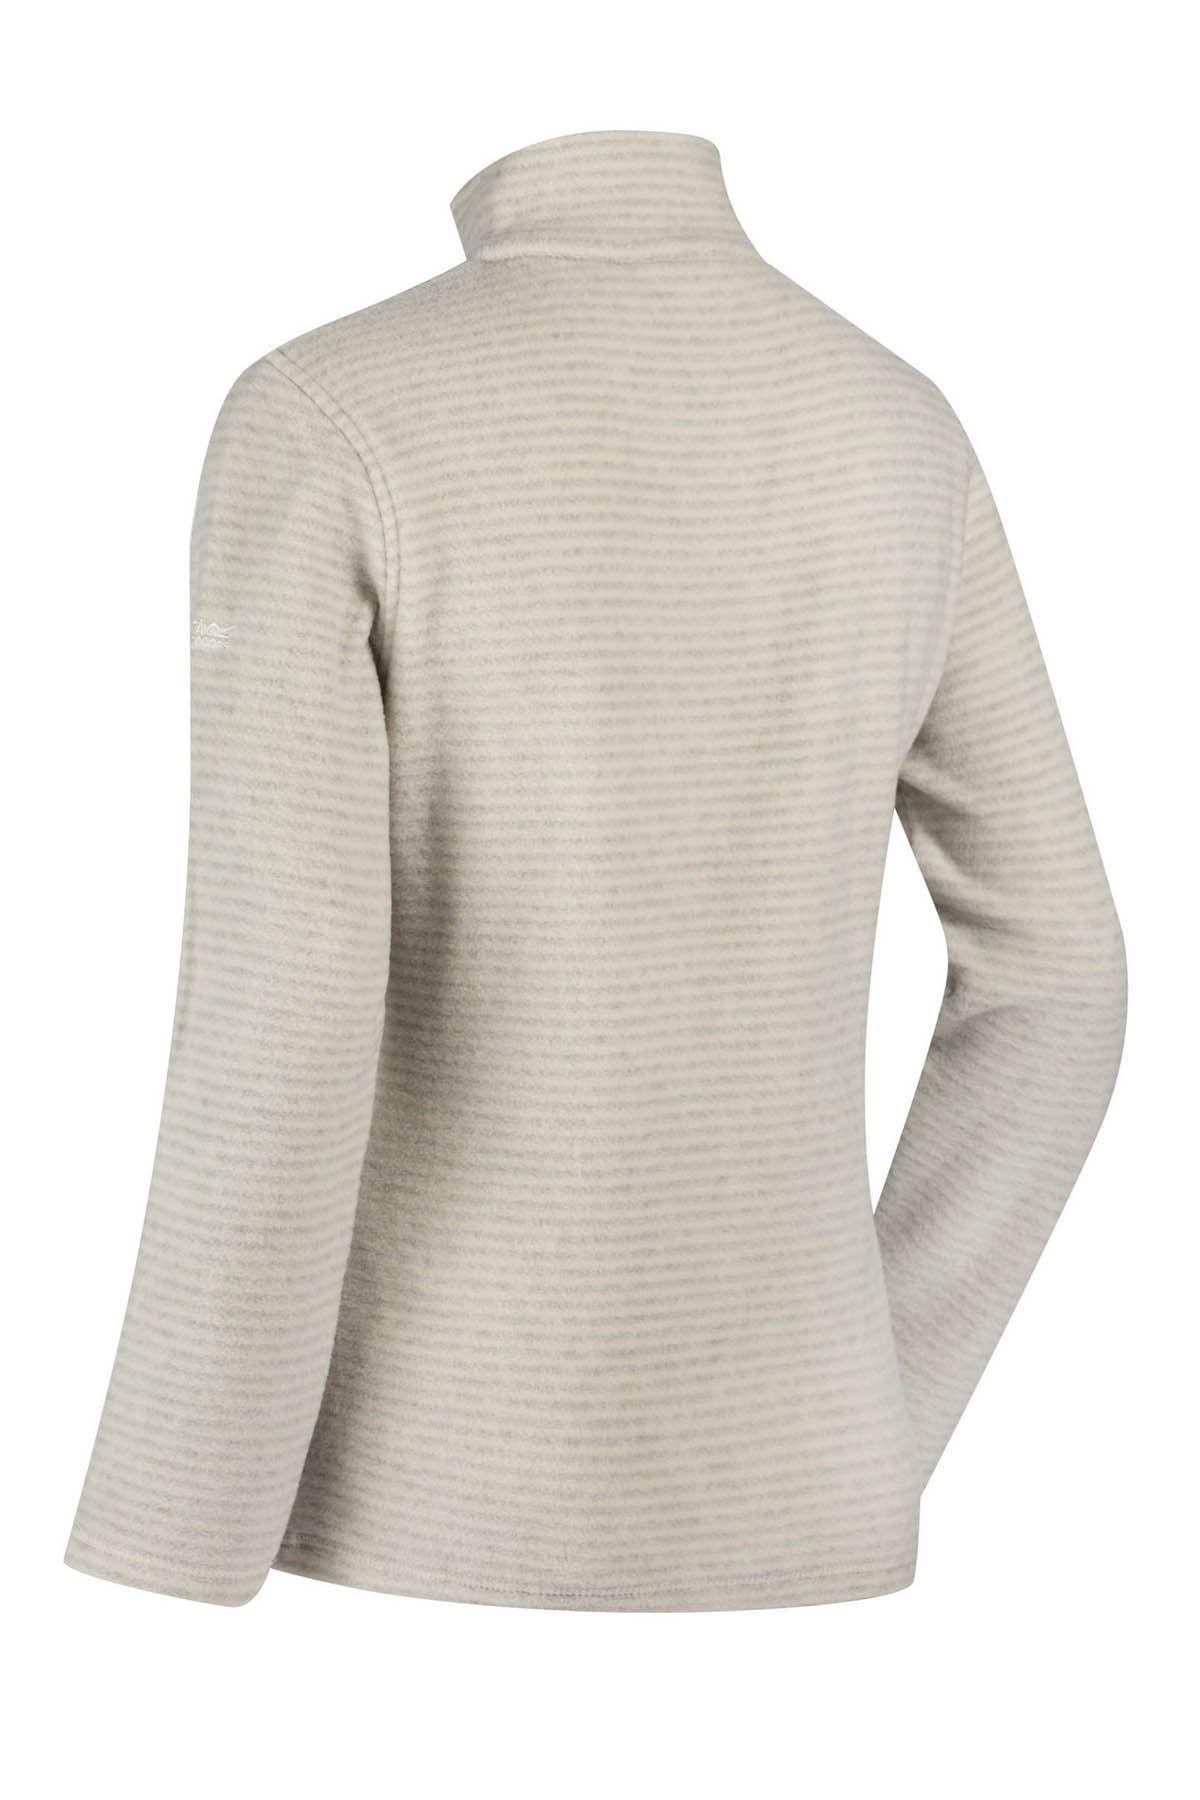 Regatta Womens Stripe Fleece Top With Half Zip Size 10 12 14 16